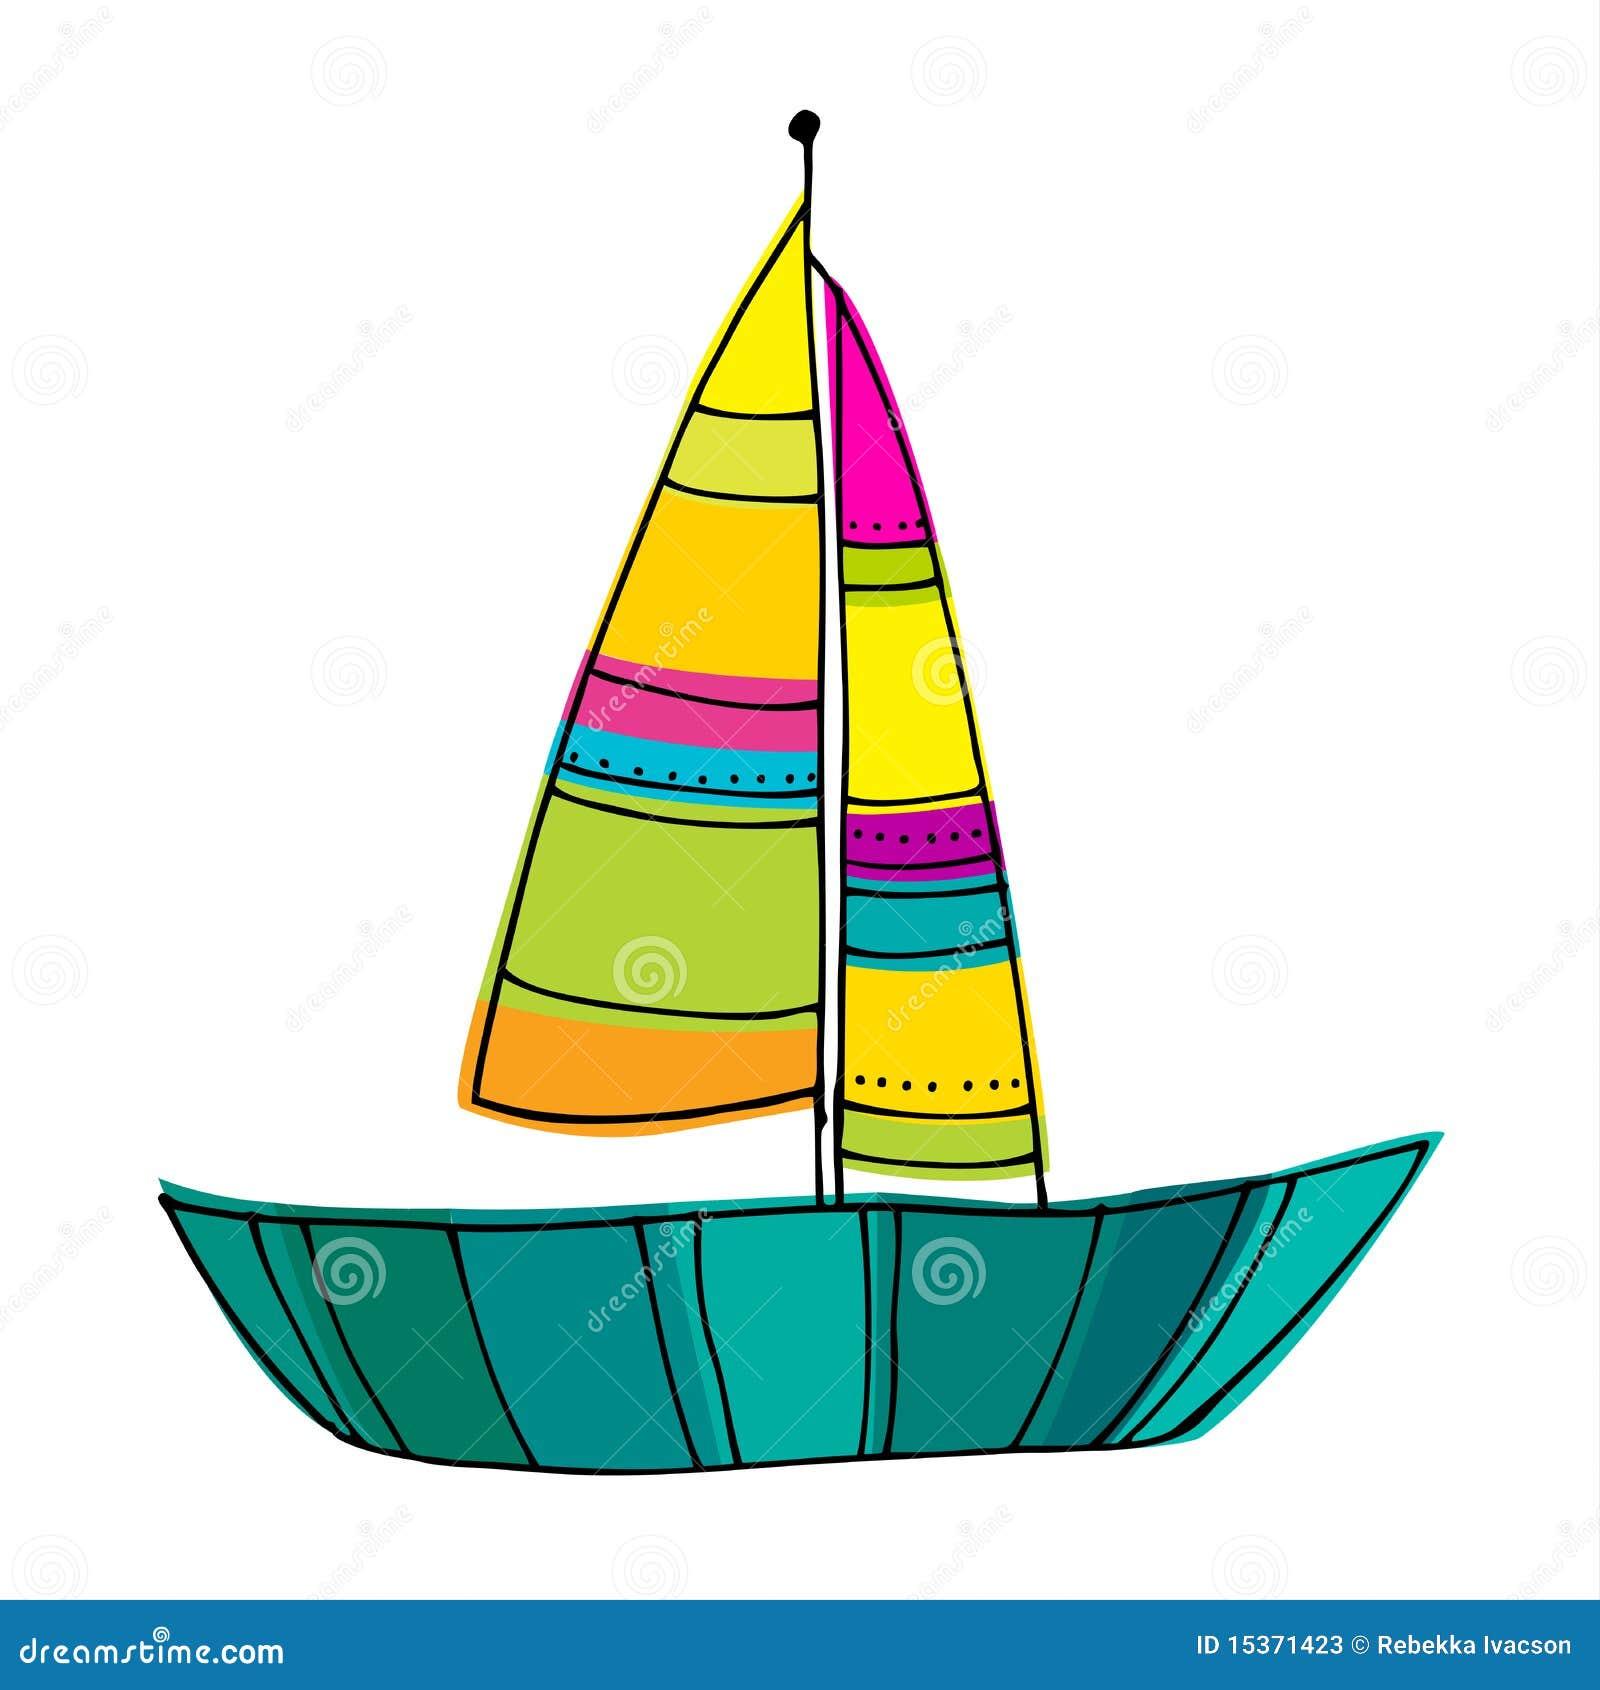 Illustrated Cute Sailing Boats Stock Vector